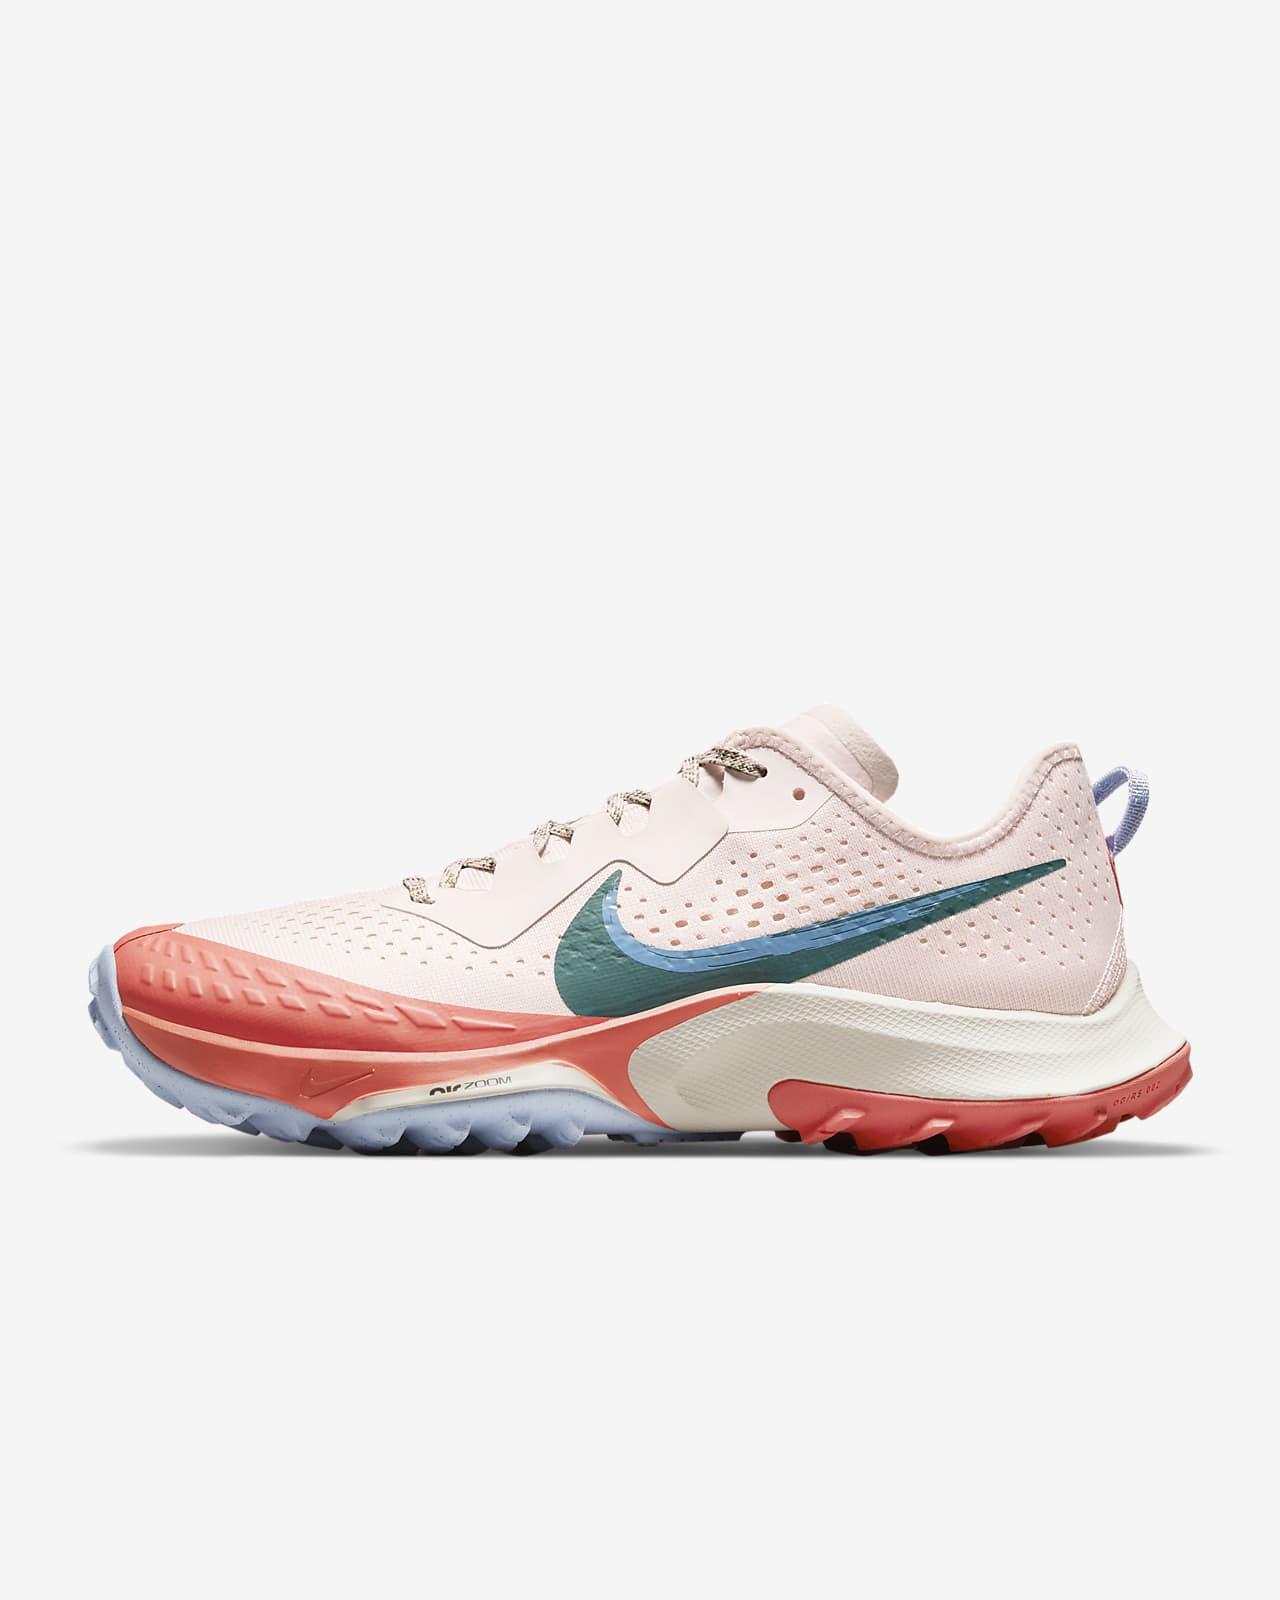 Calzado de trail running para mujer Nike Air Zoom Terra Kiger 7